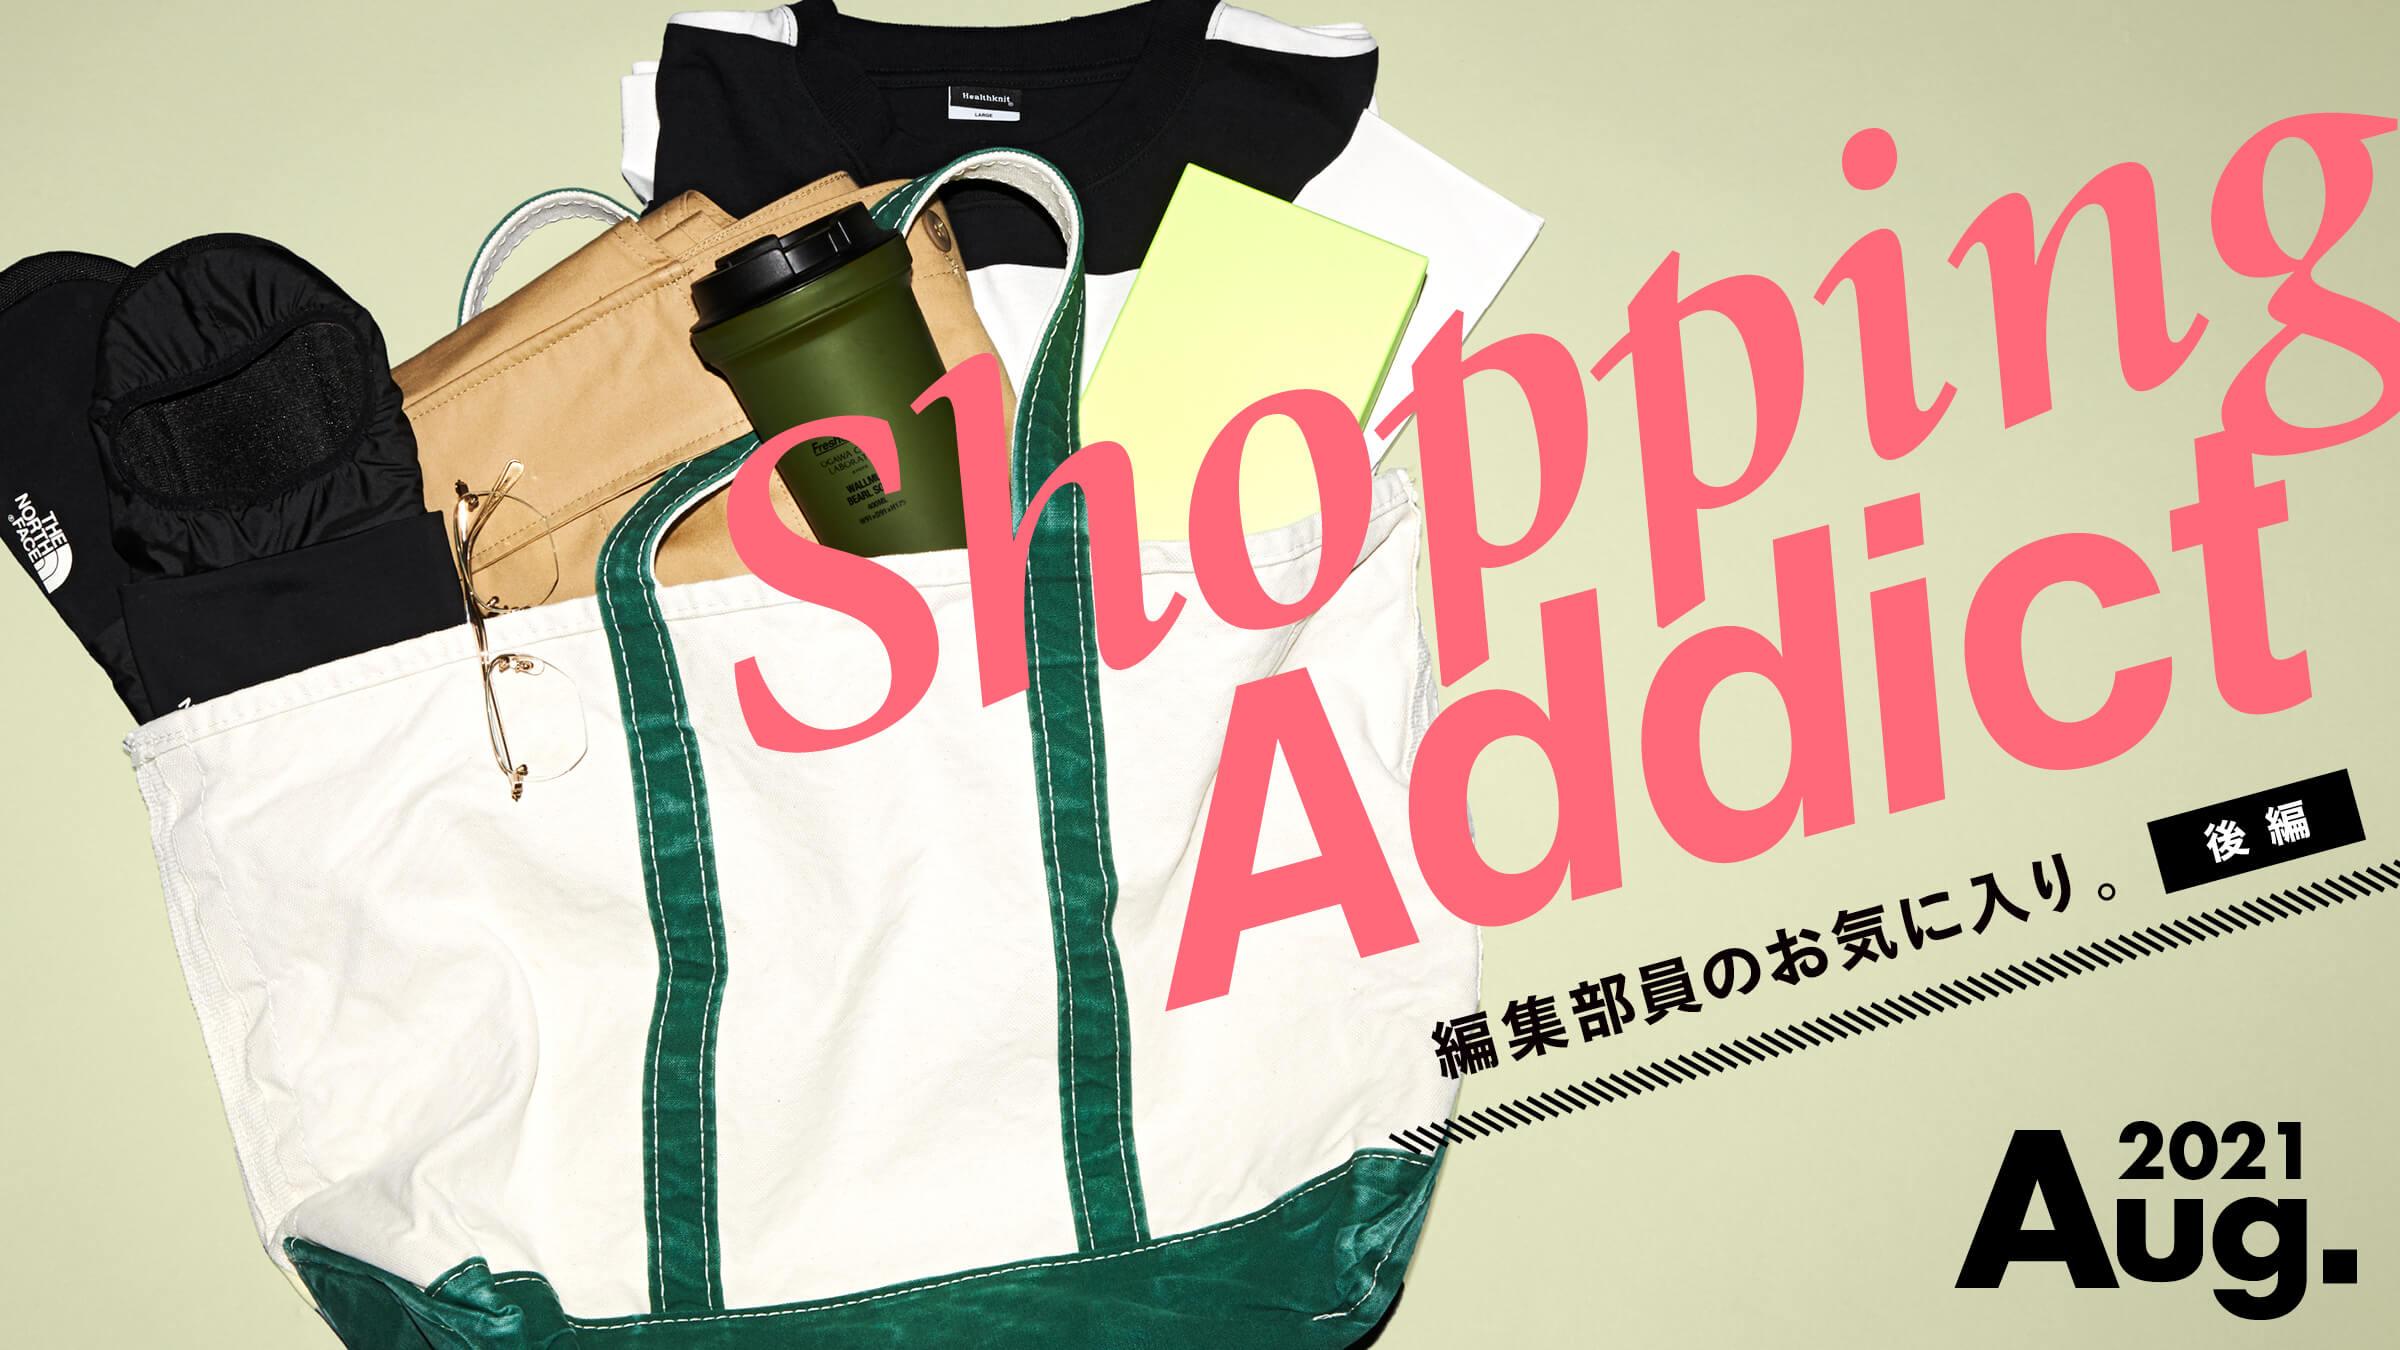 Shopping Addict 2021 Aug.〜編集部員のお気に入り〜 後編